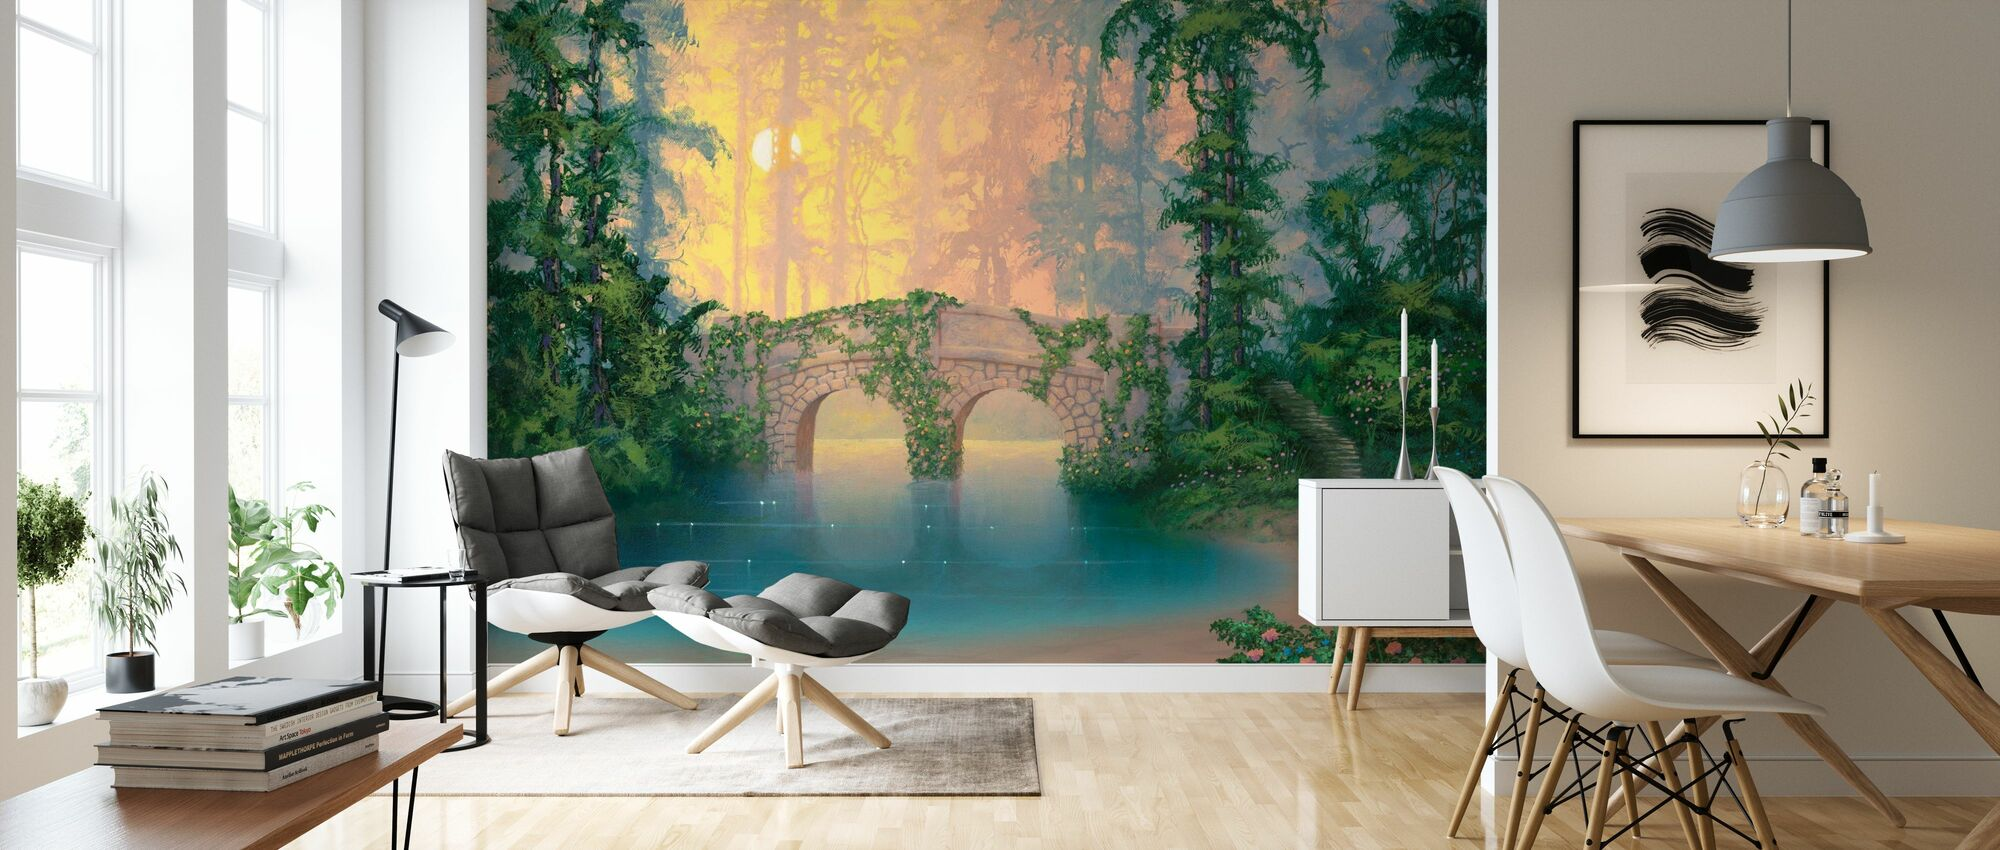 Heaven On Earth - Wallpaper - Living Room